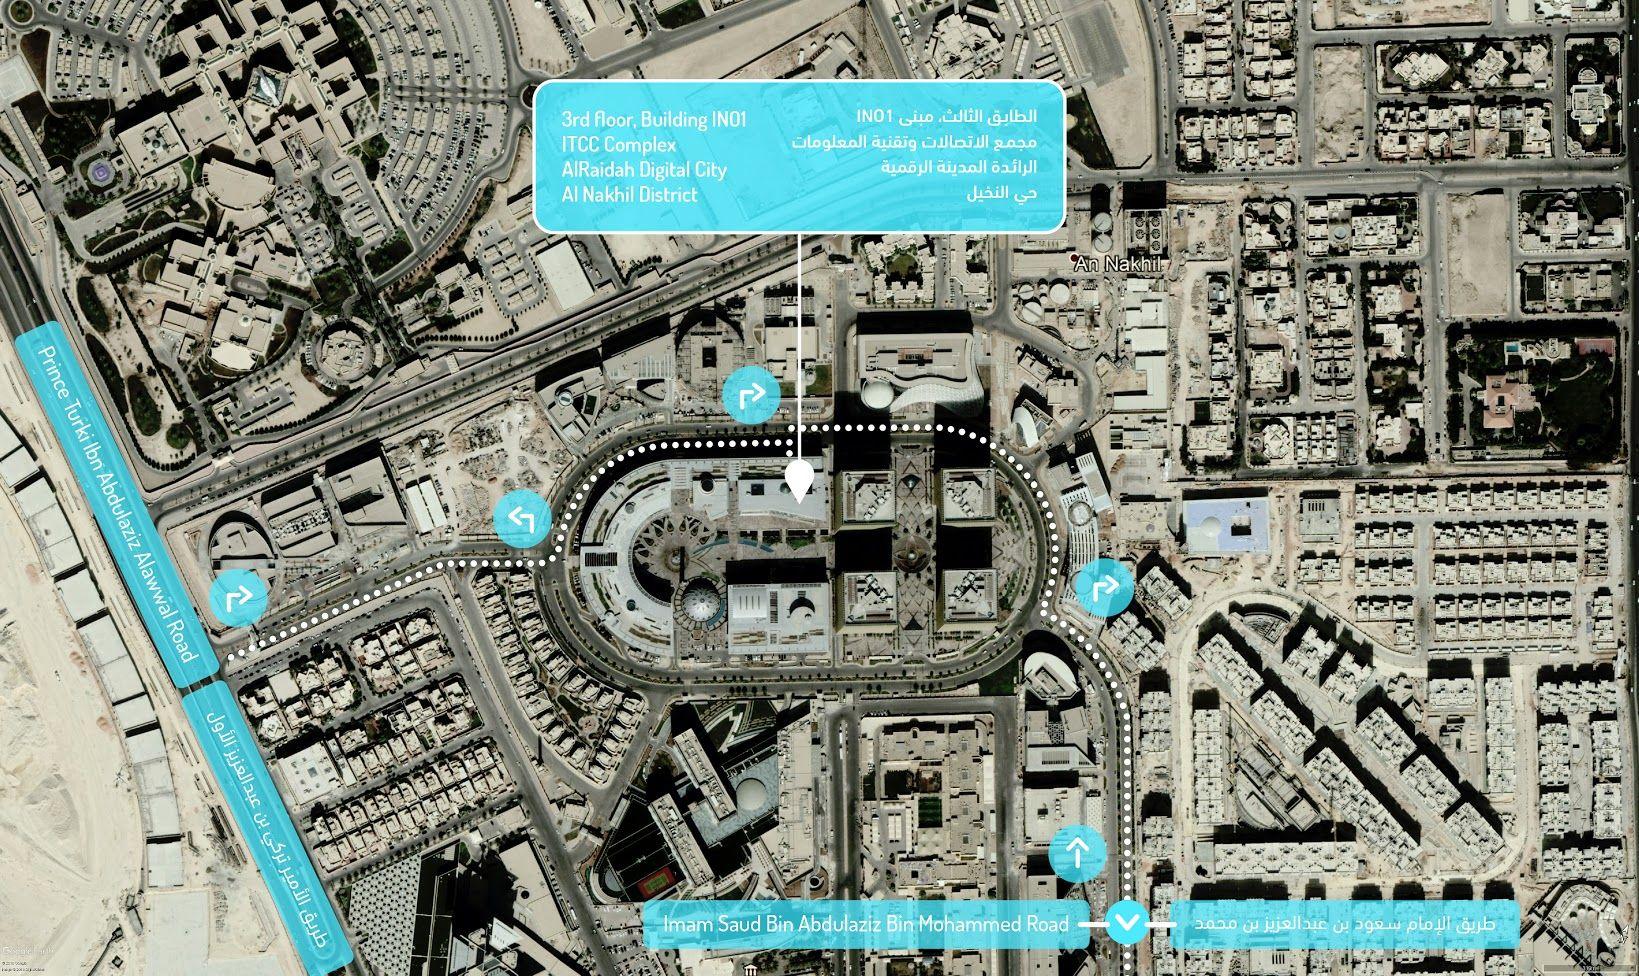 Displaying Shipment Pick Up Office Location Jpg City Photo Digital Aerial